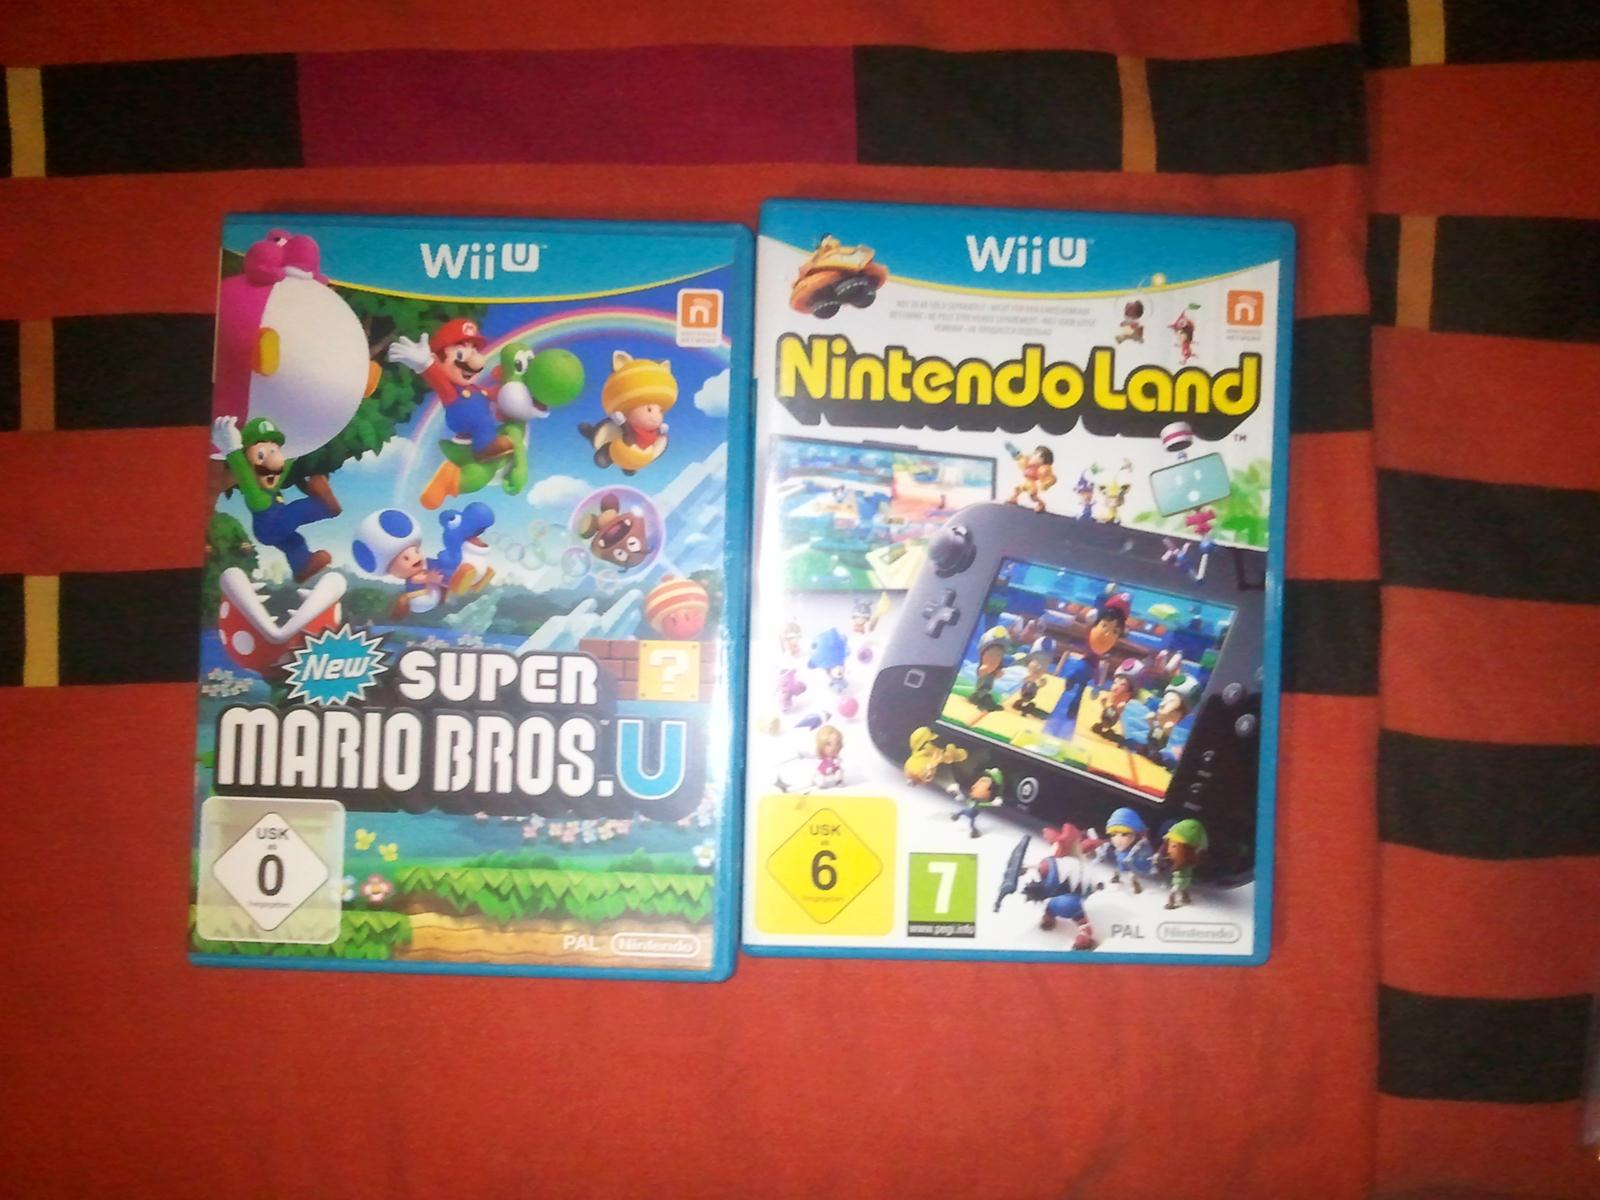 Wii U Games 2013 : Die nintendo wii u im fokus smartphone